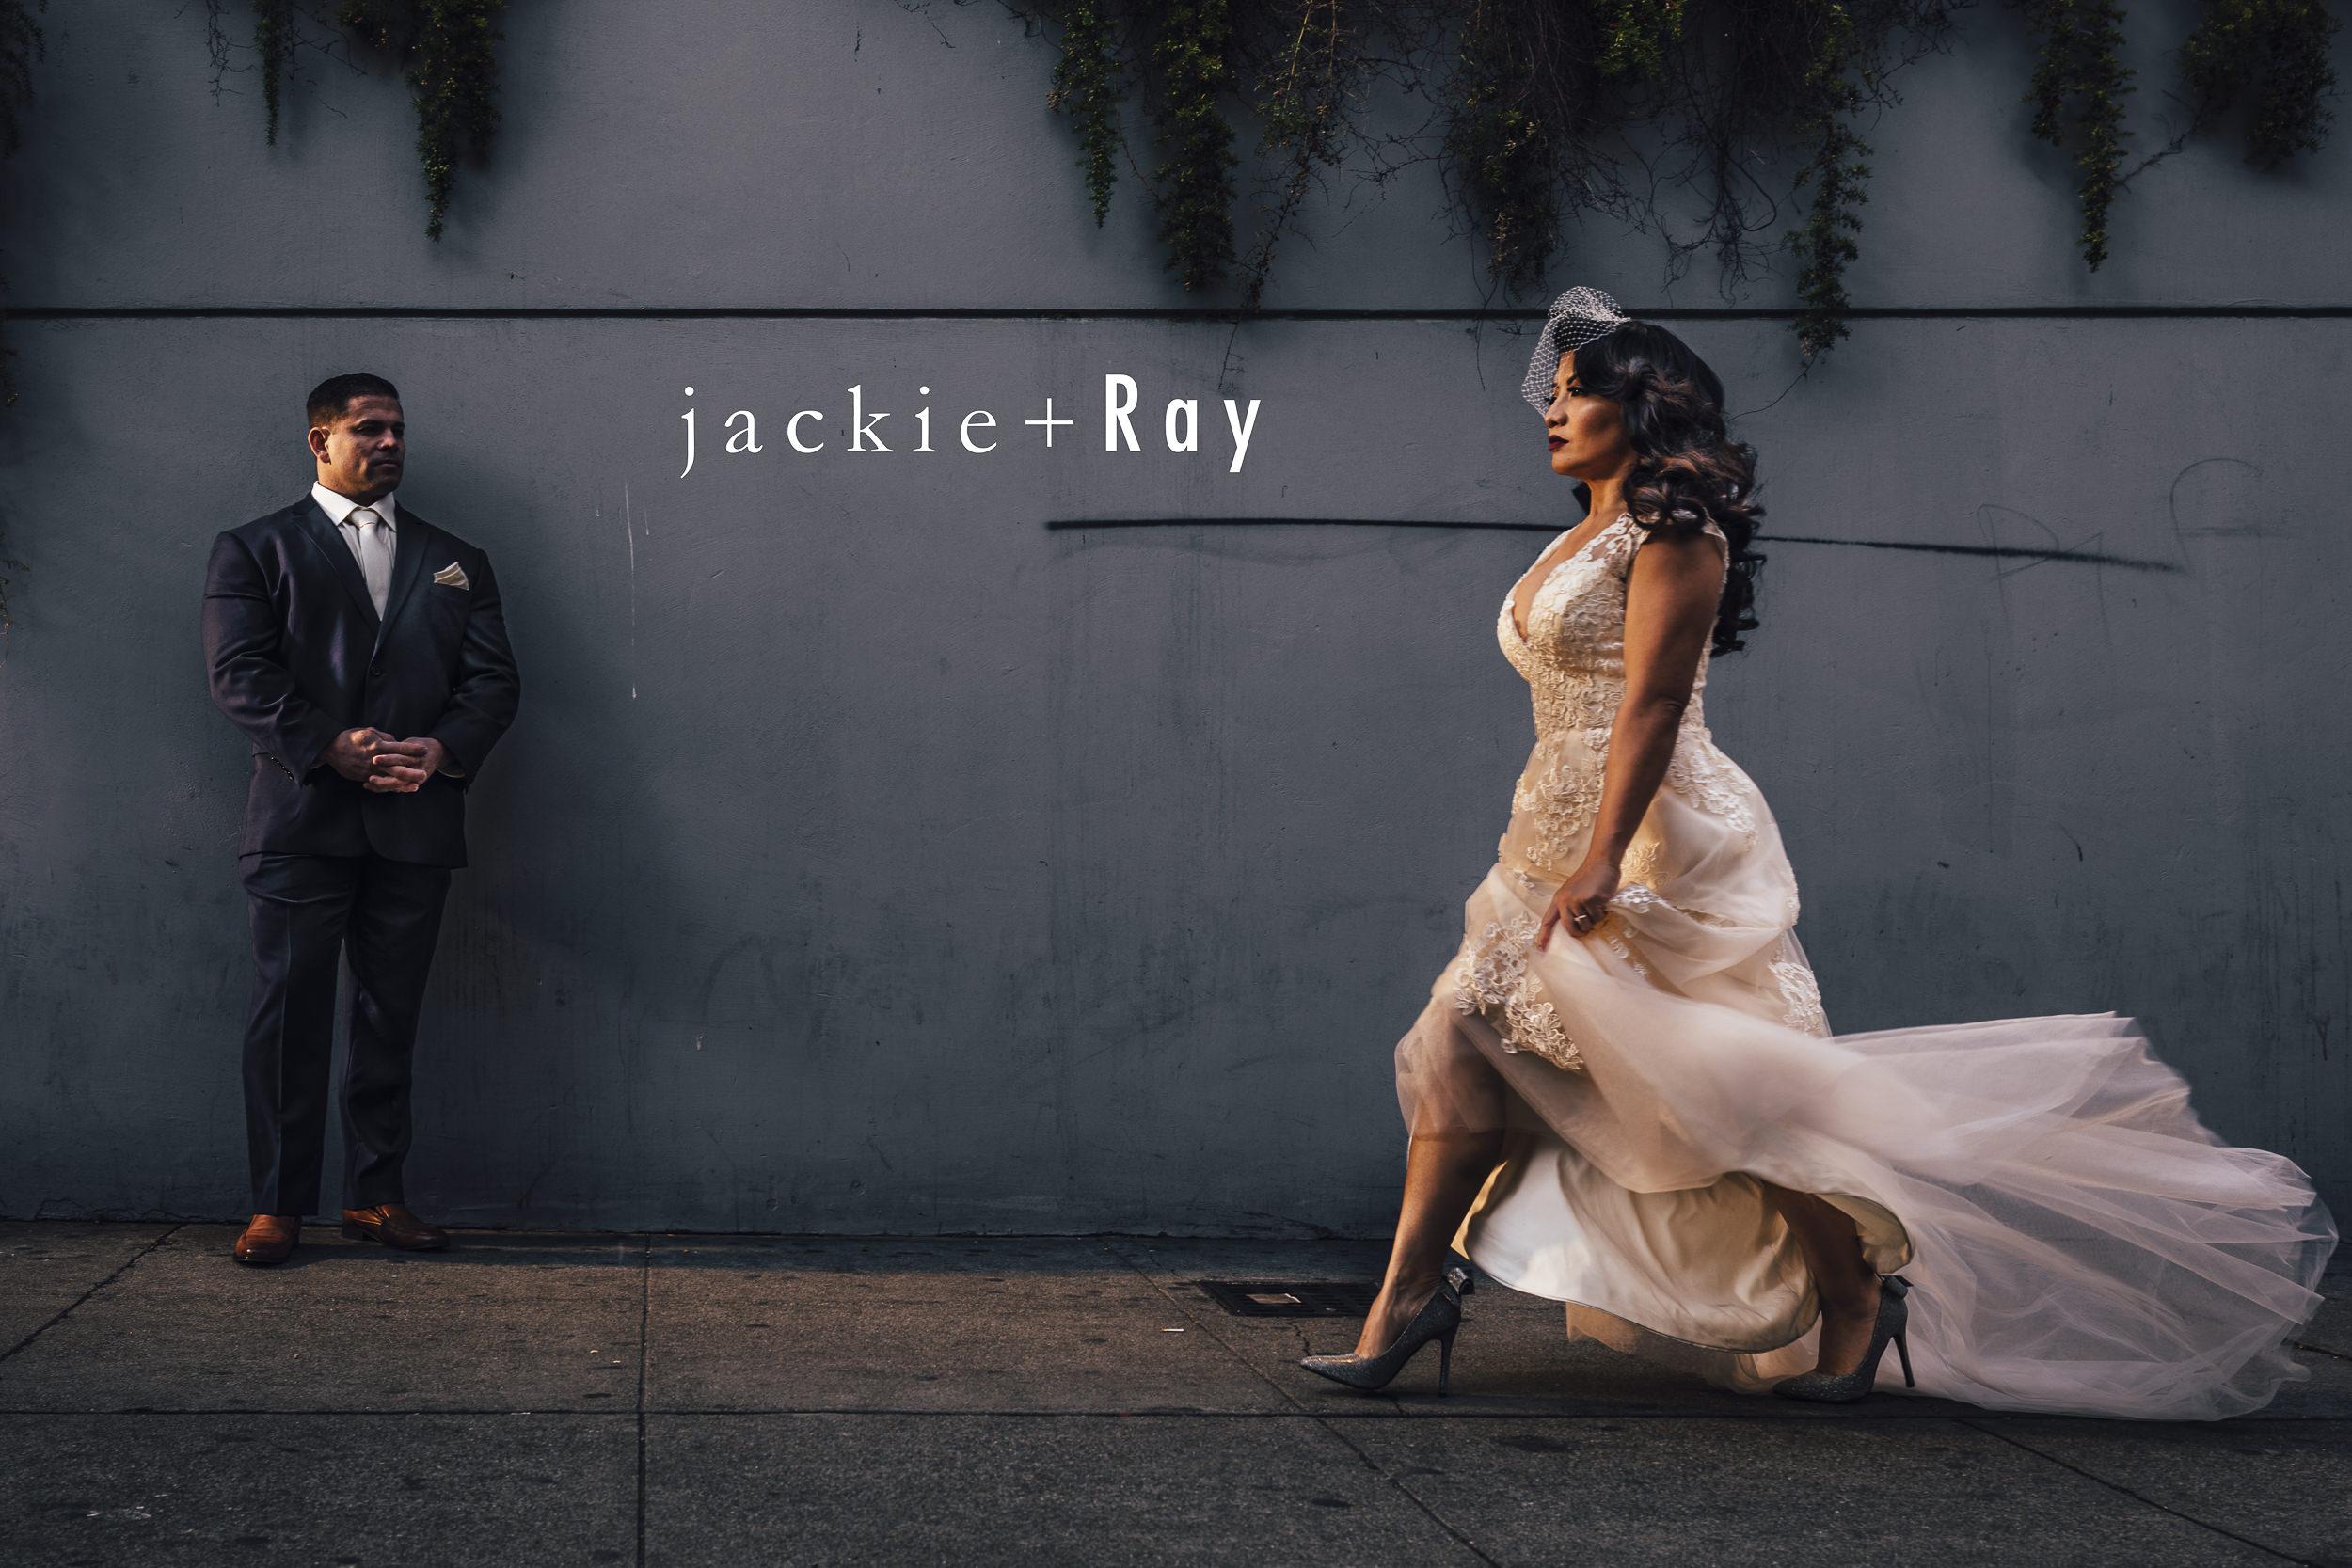 20171213-SanFranciscoCityHallWedding-HayesValleyEngagement-JackieRay-001.jpg